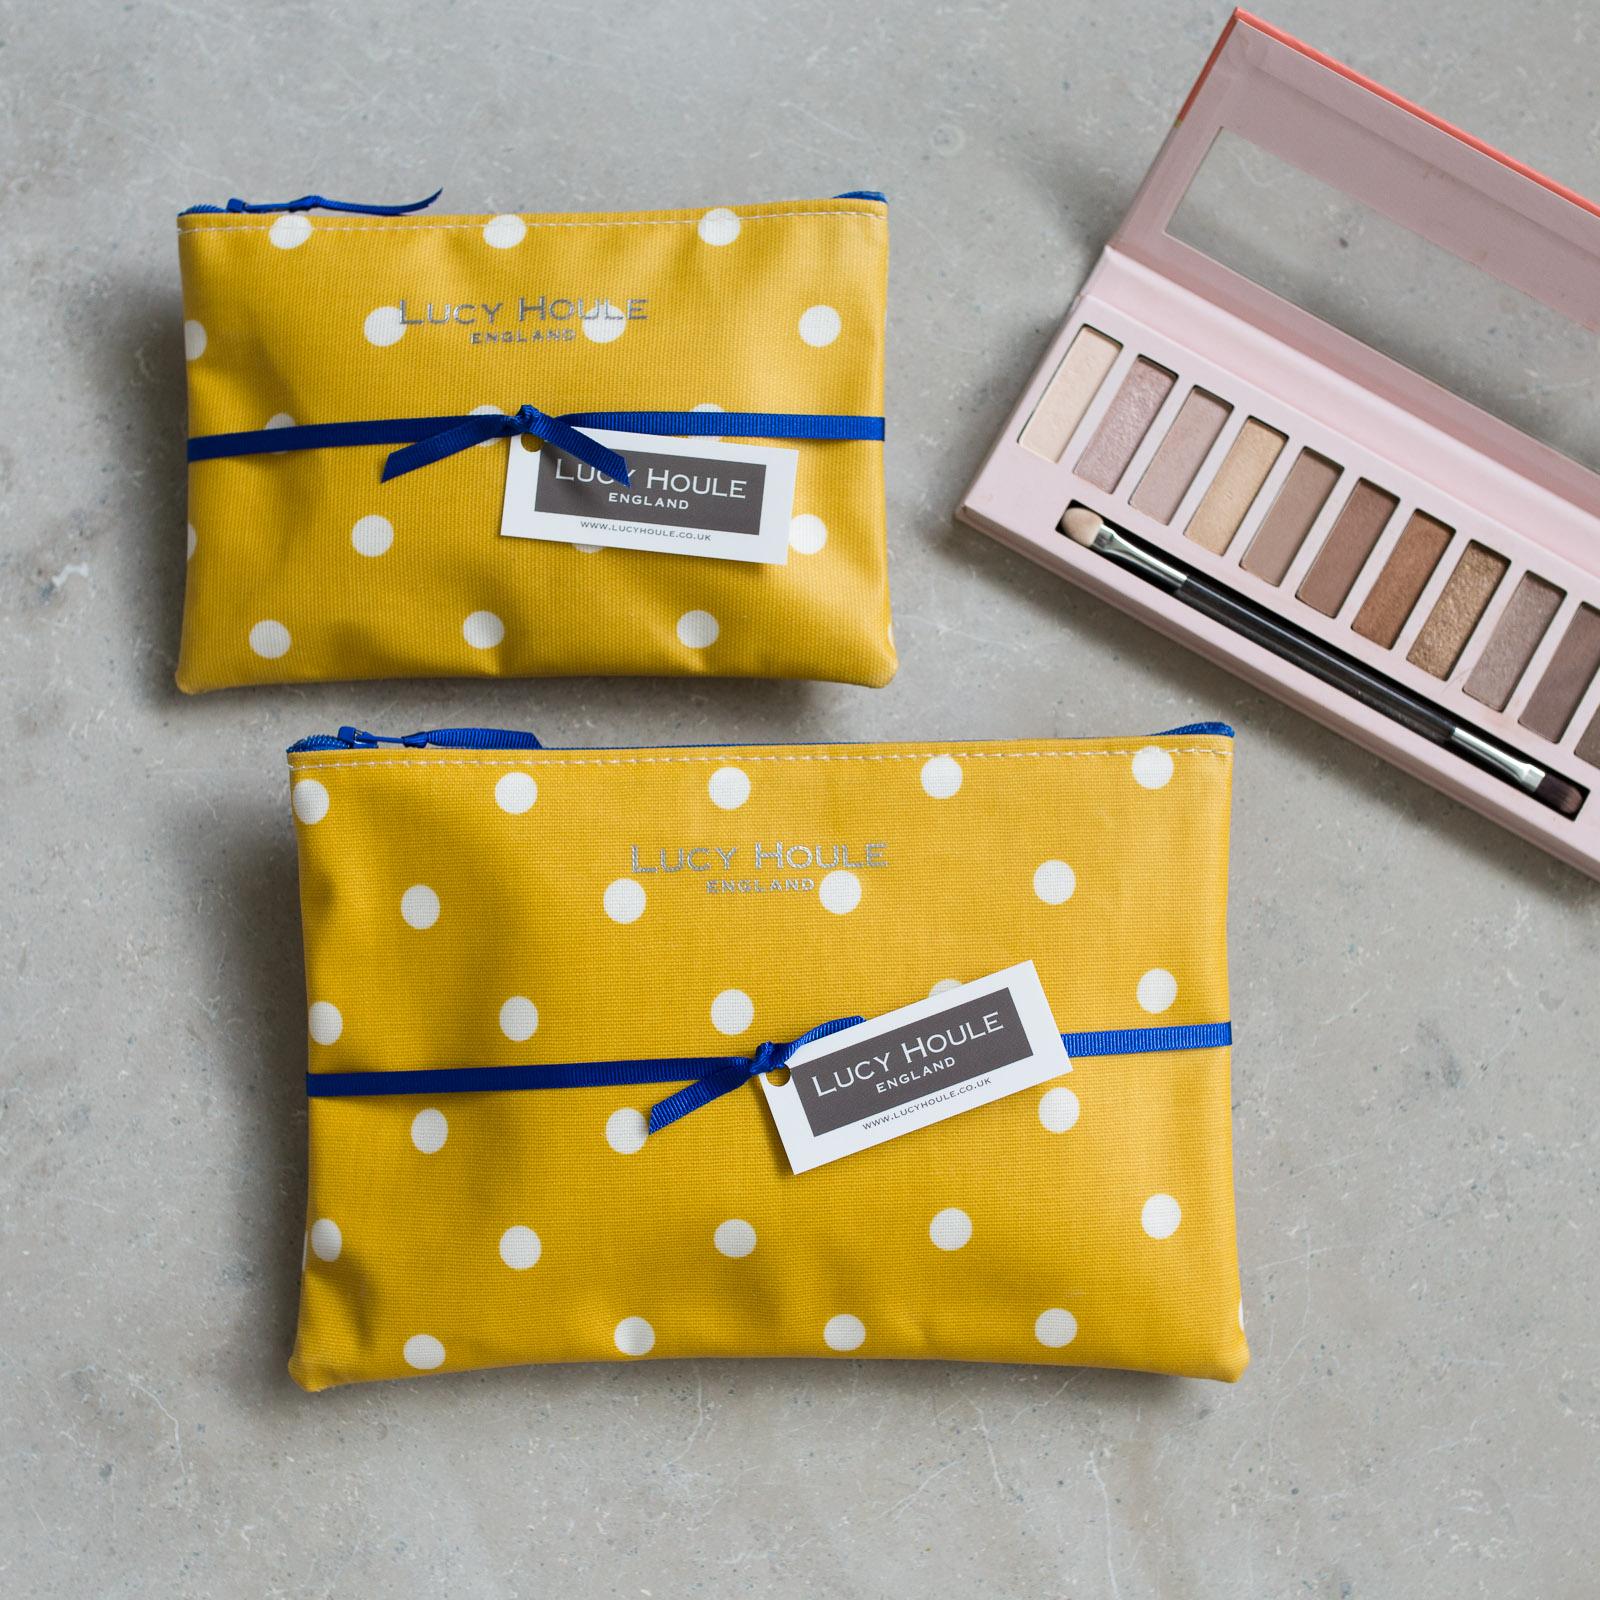 Honey & White Spot Make-Up Bag with Cobalt Blue Zip